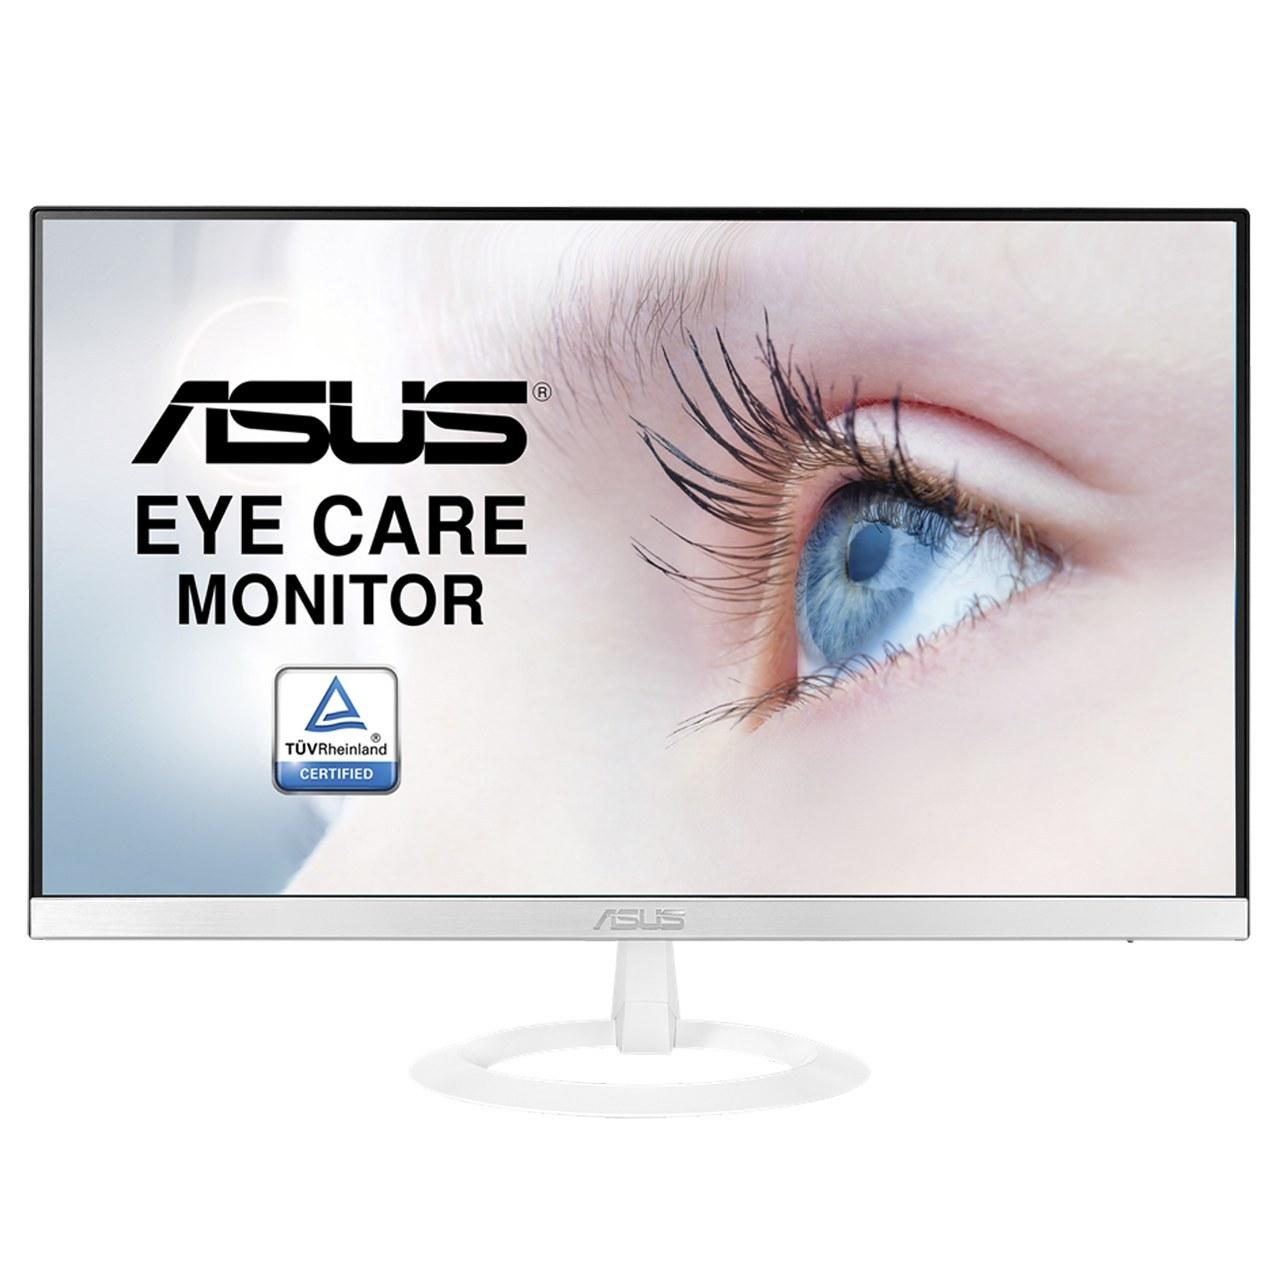 تصویر مانیتور ایسوس مدل ASUS VZ249HE_W سایز 23.8 اینچ ASUS VZ249HE_W 23.8 inches monitor